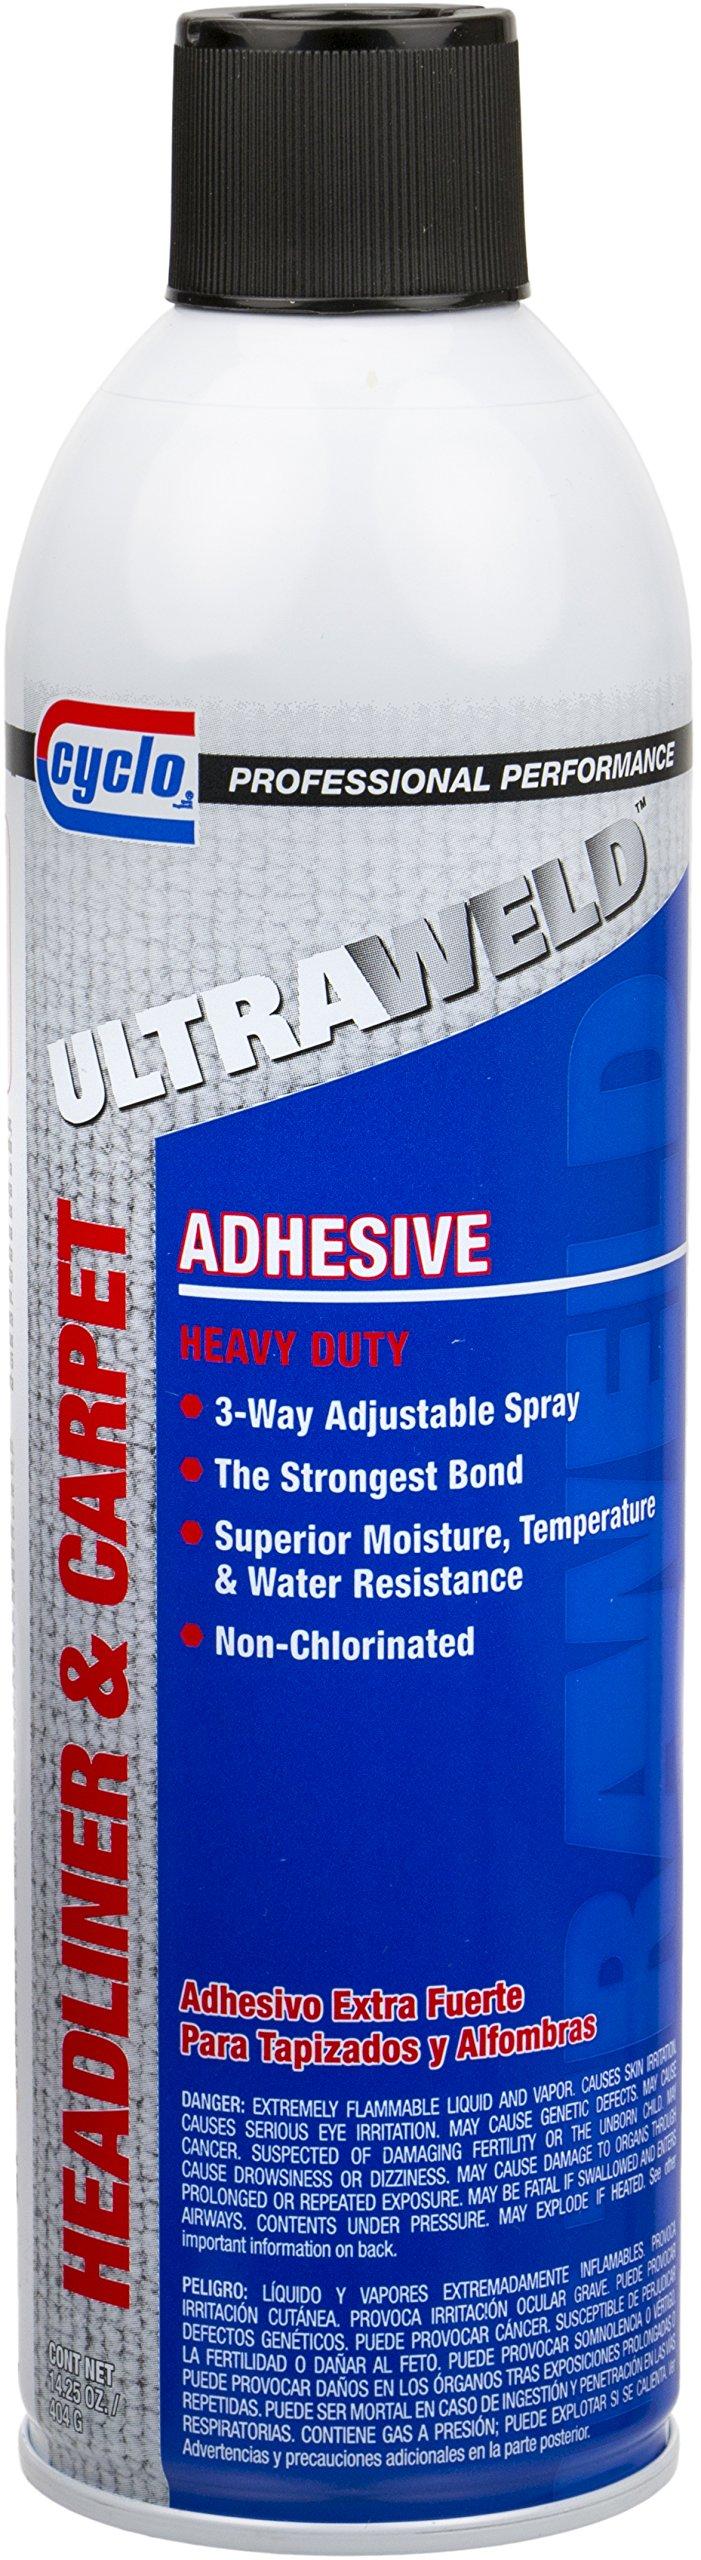 Niteo Cyclo ULTRAWELD Headliner & Carpet Adhesive, Aerosol Spray, 14.25 fl oz, Case of 12